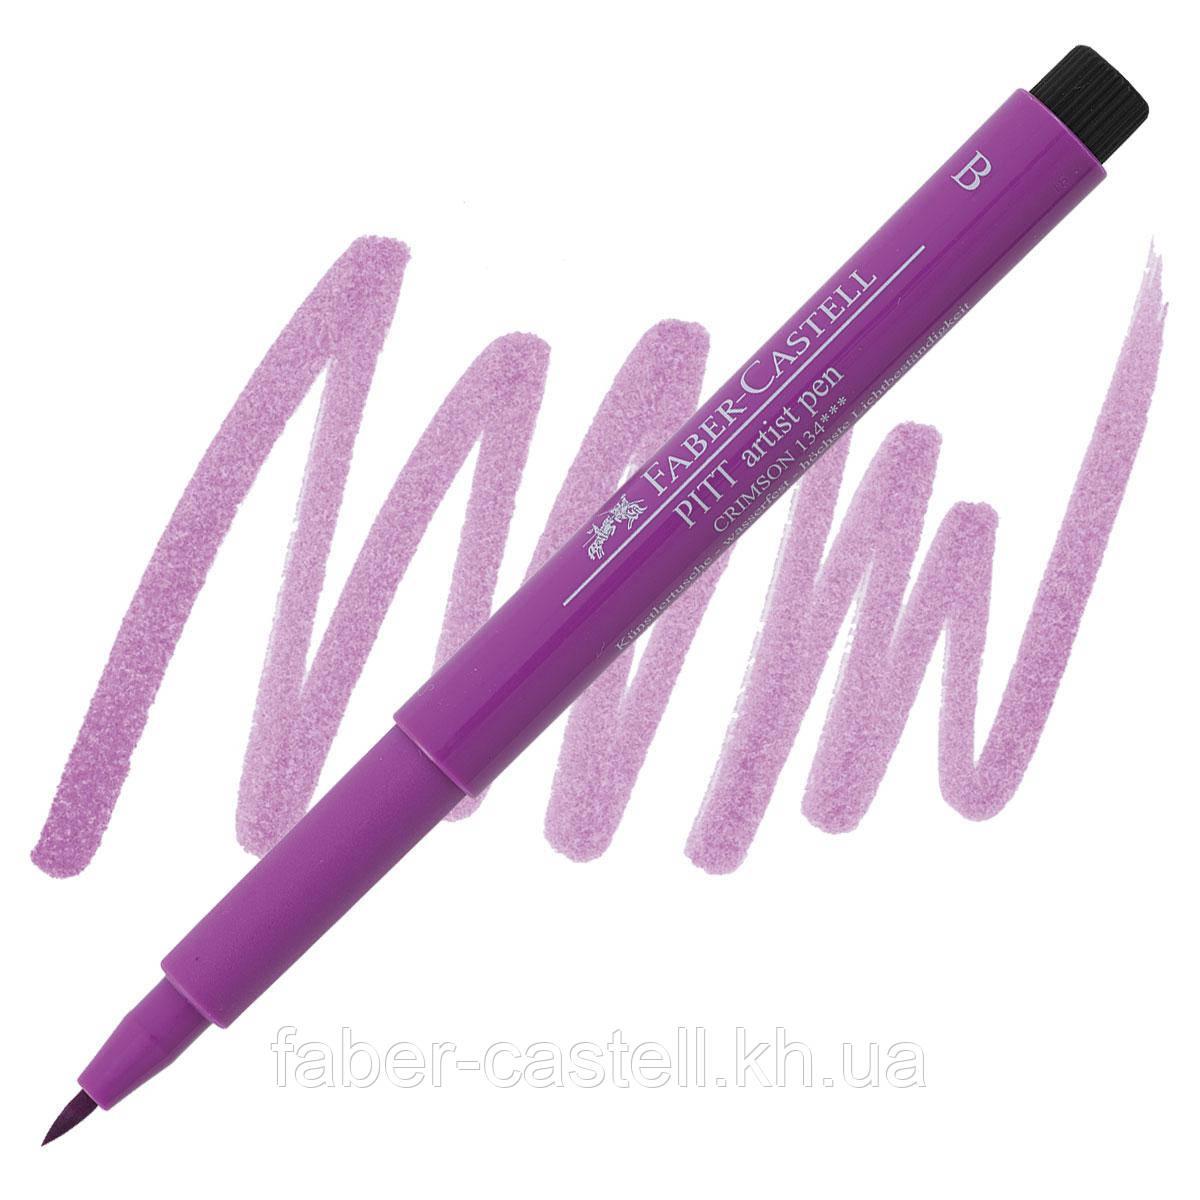 "Ручка-кисточка капиллярная Faber - Castell PITT® ARTIST PEN ""BRUSH"" №134 малиновый, 167434"